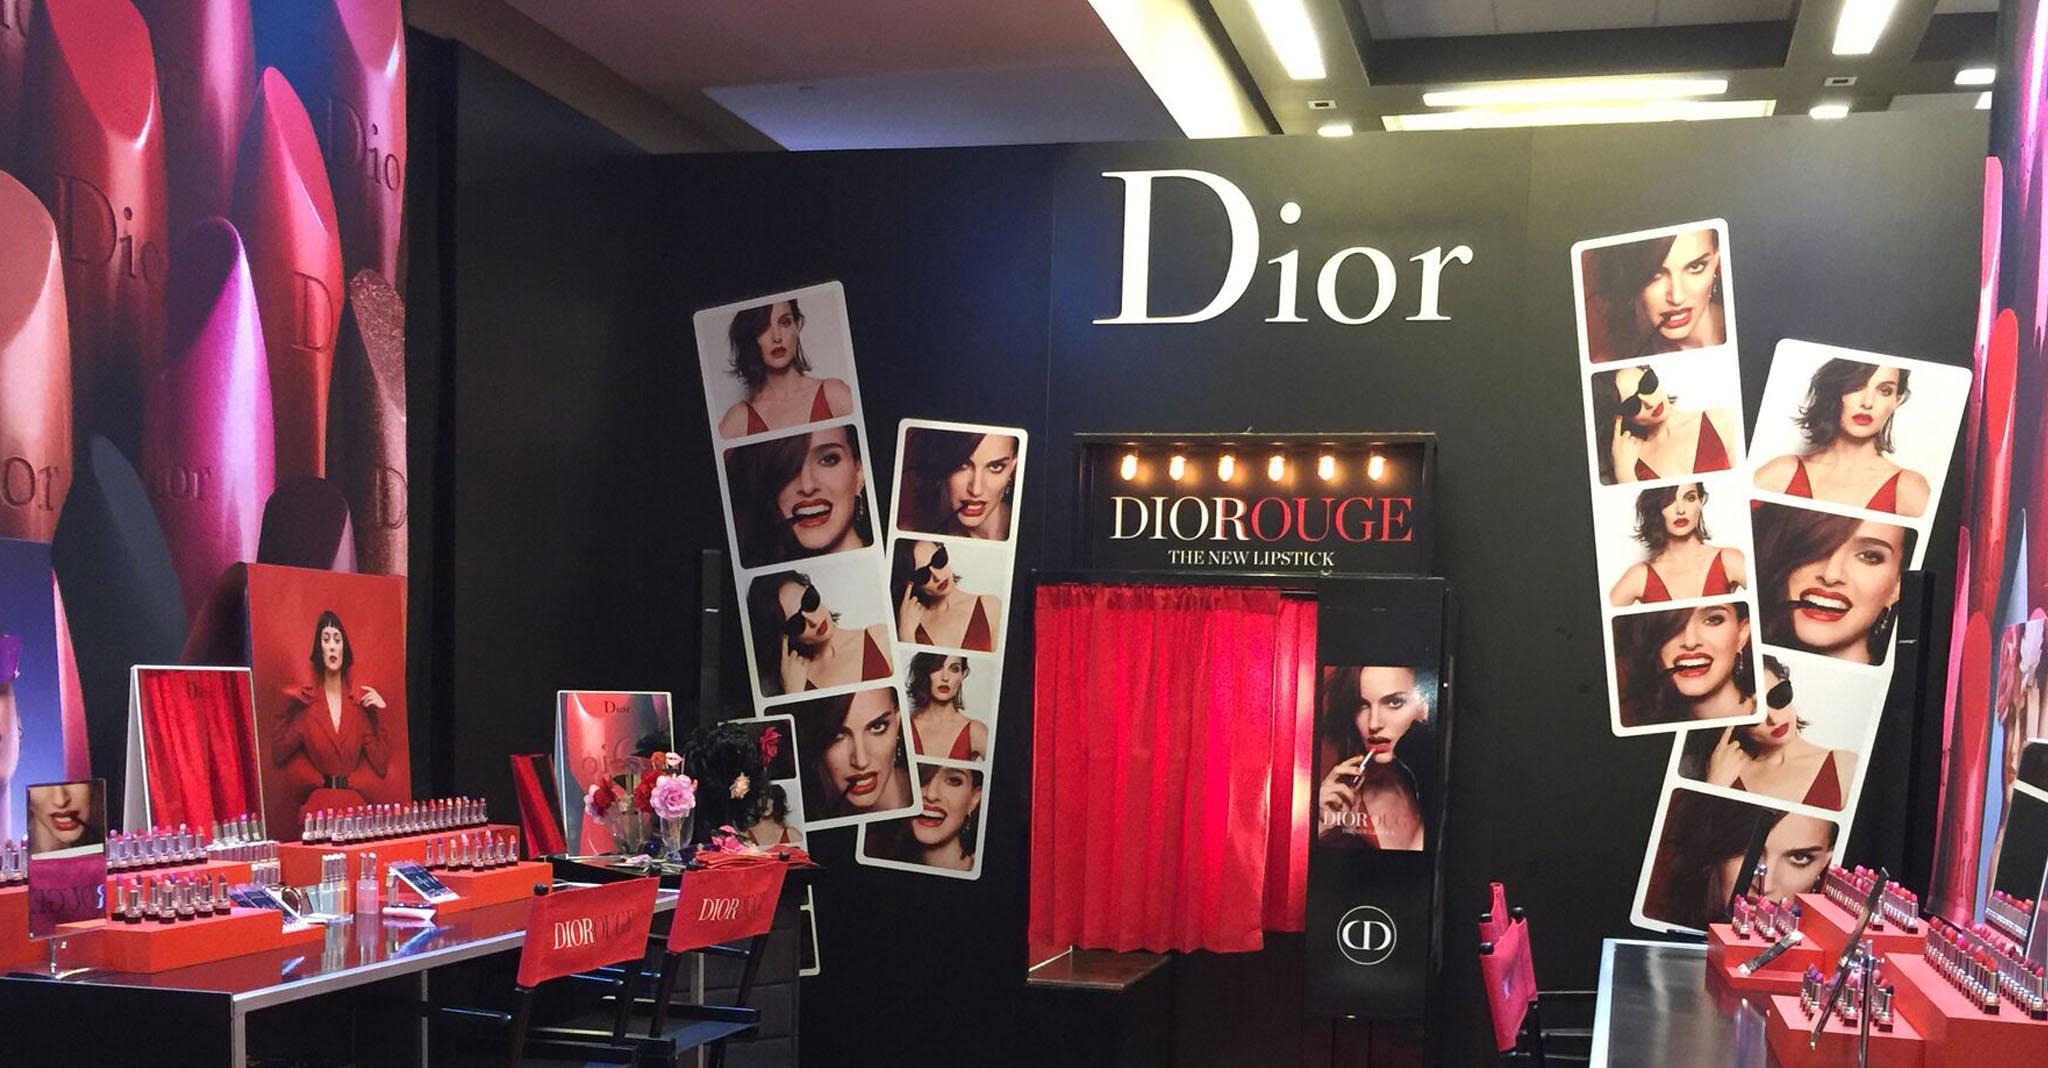 dior-photo-booth-custom-vinyl-wrap.jpg